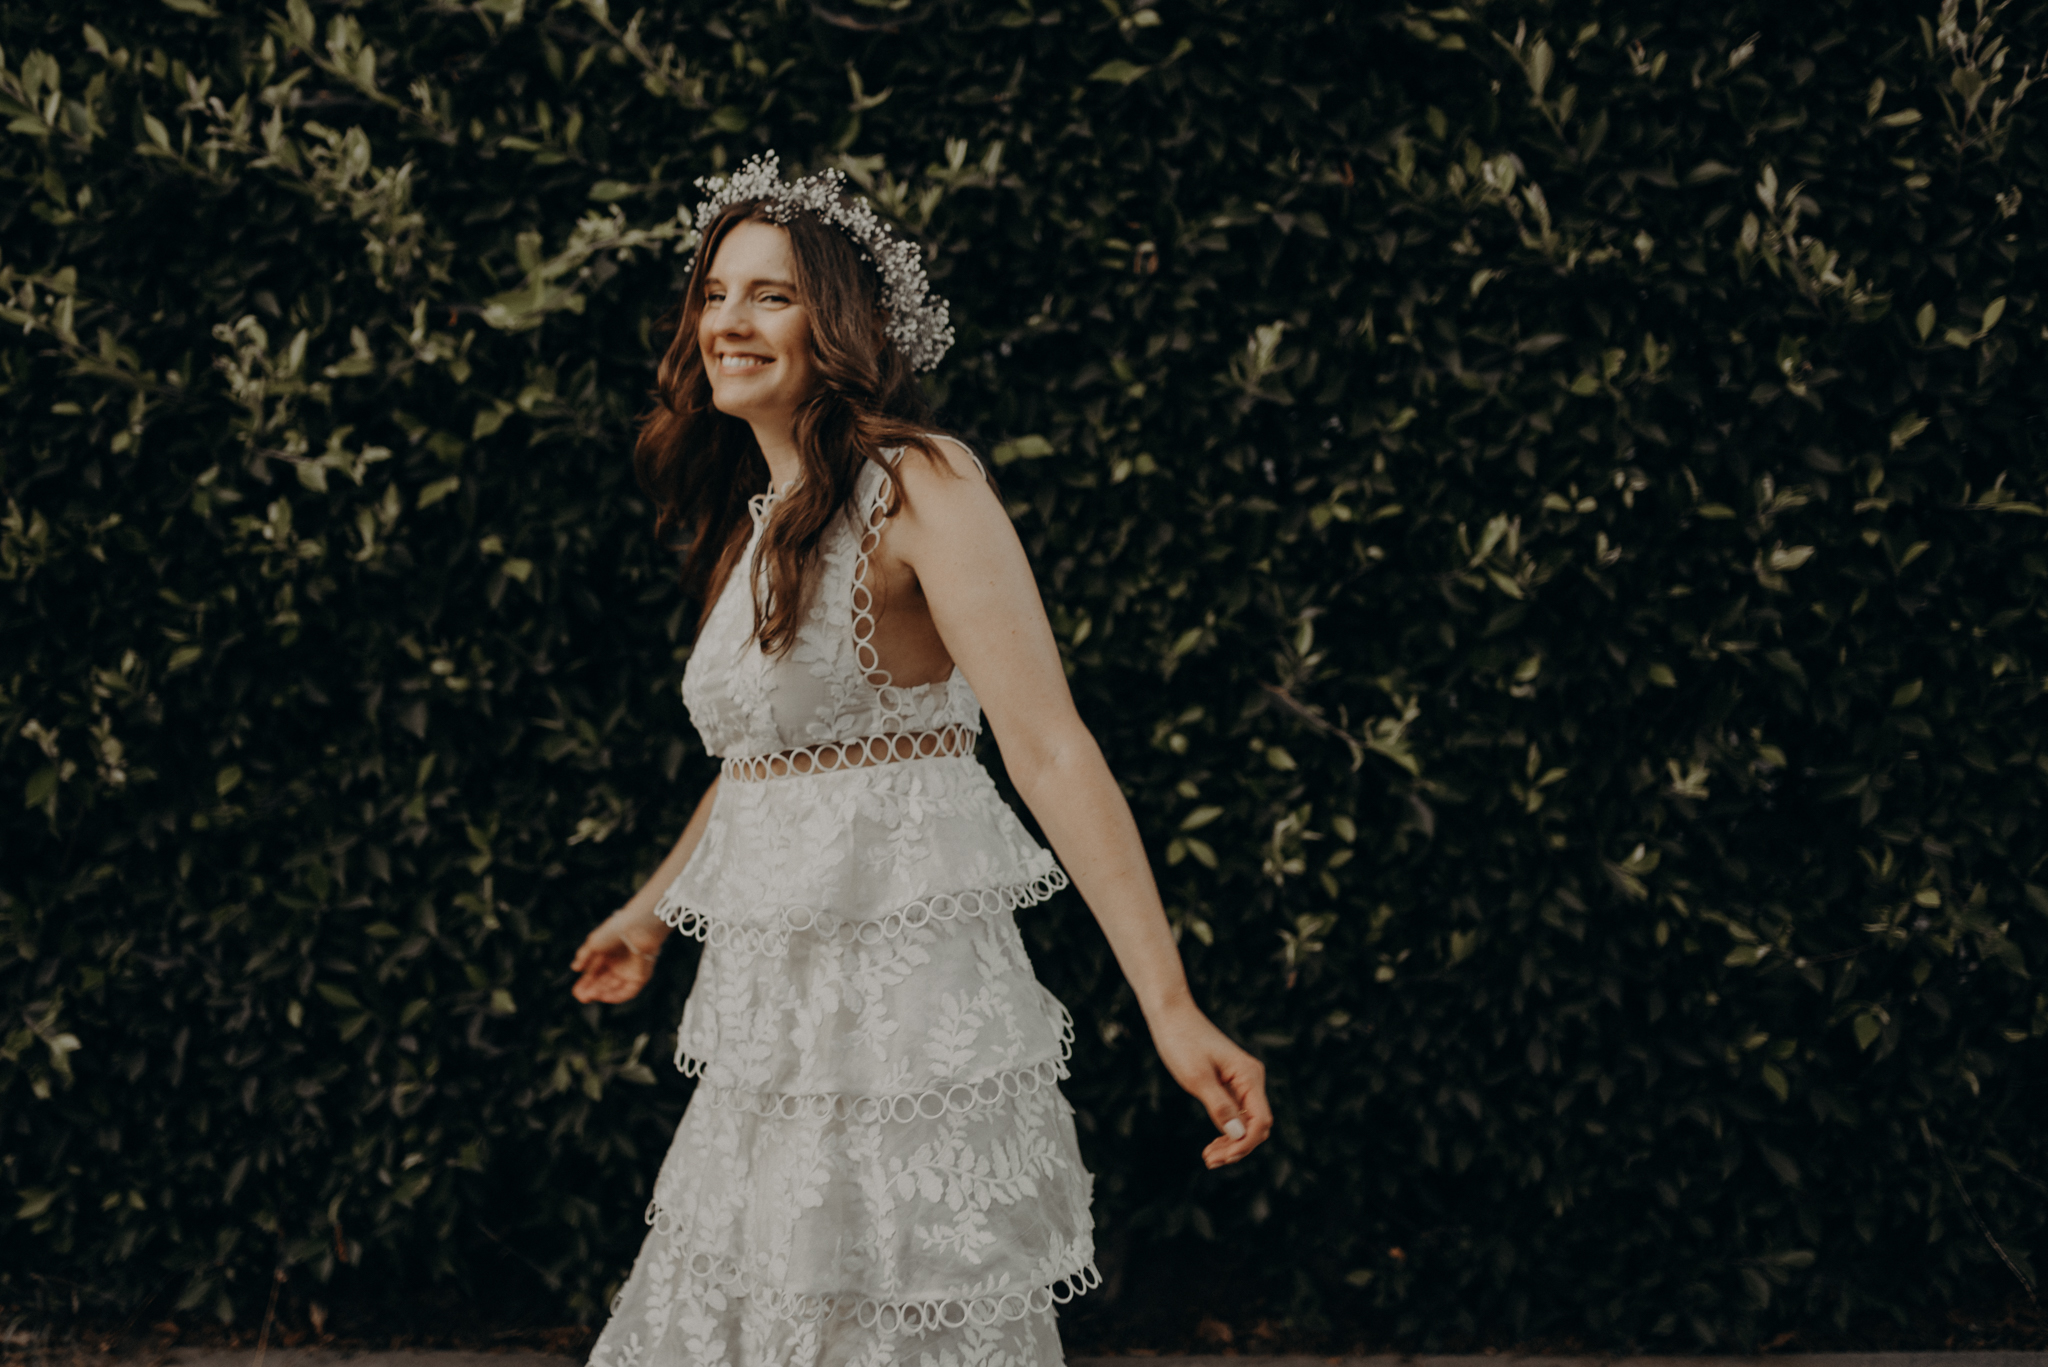 Isaiah + Taylor Photography - Private Estate Backyard Wedding - Beverly Hills - Los Angeles Wedding Photographer - 119.jpg